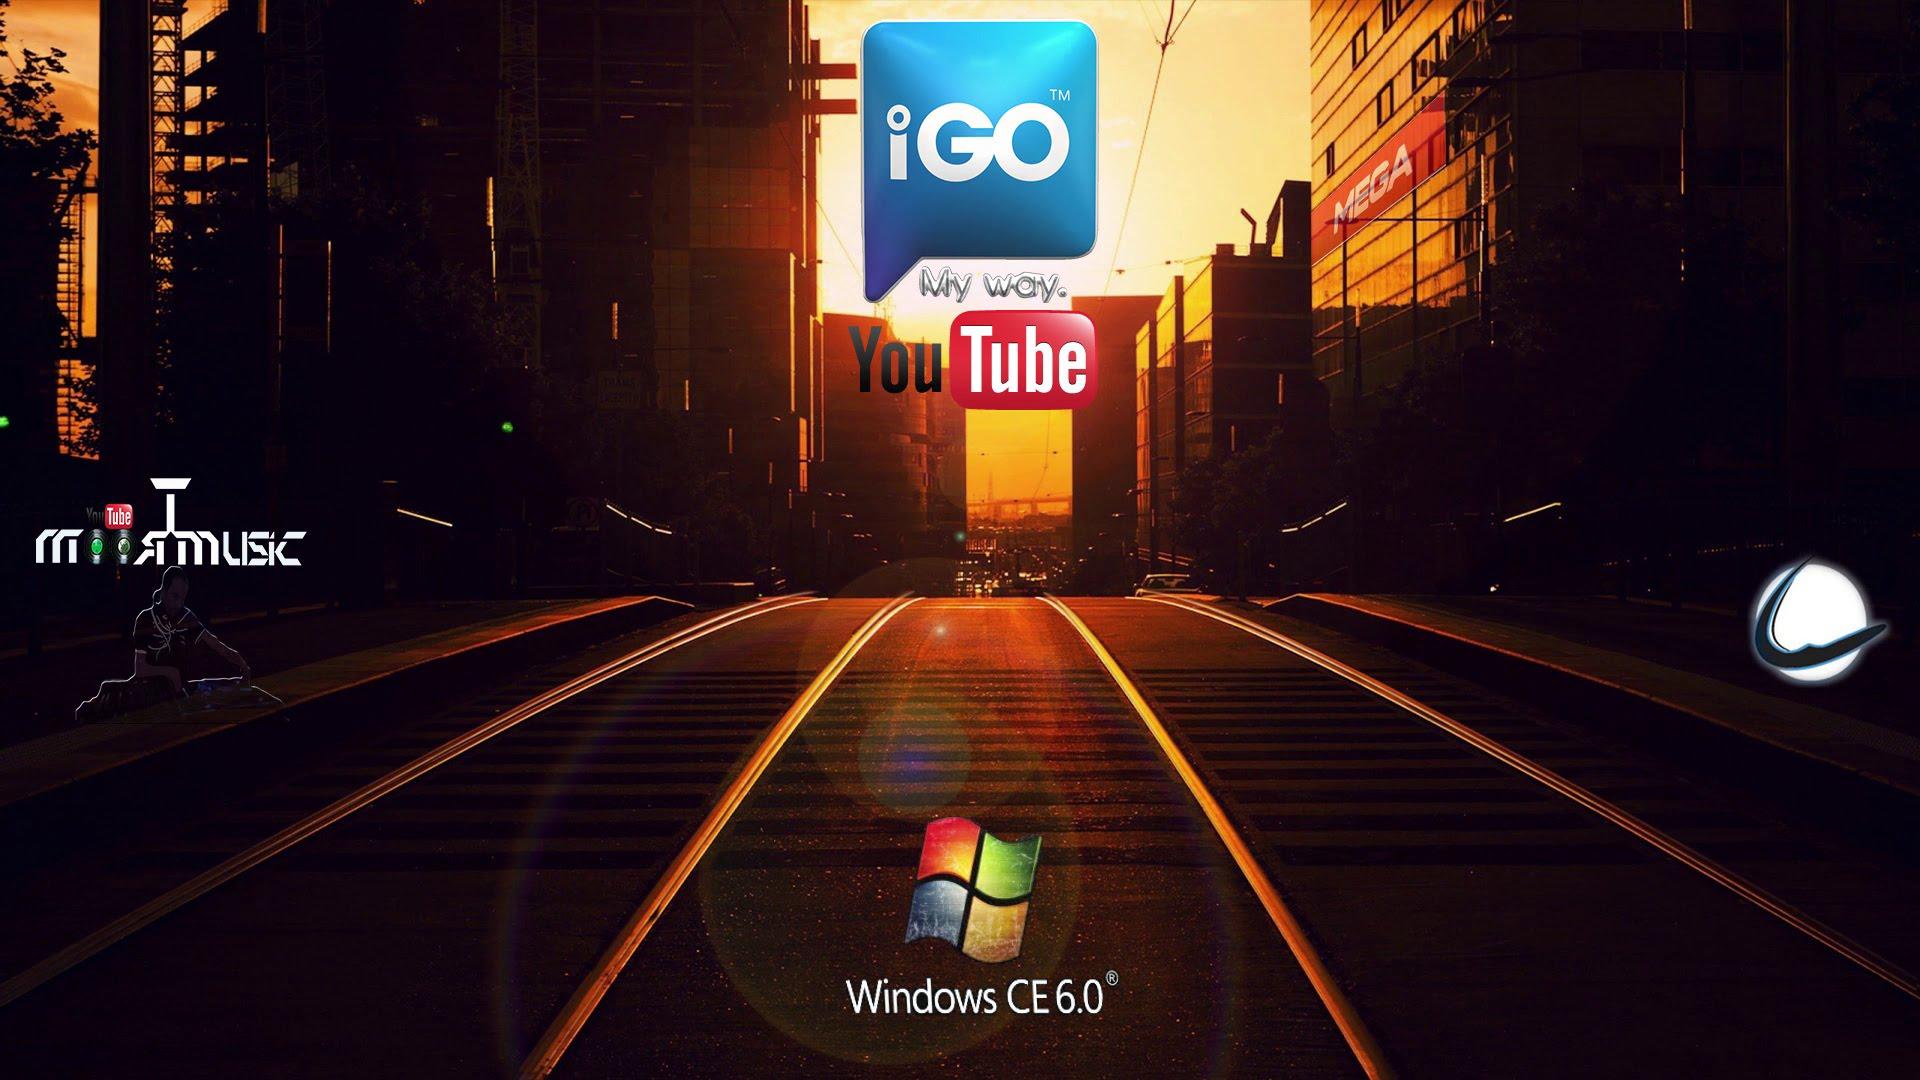 IGO Primo 9  aka Win CE 6